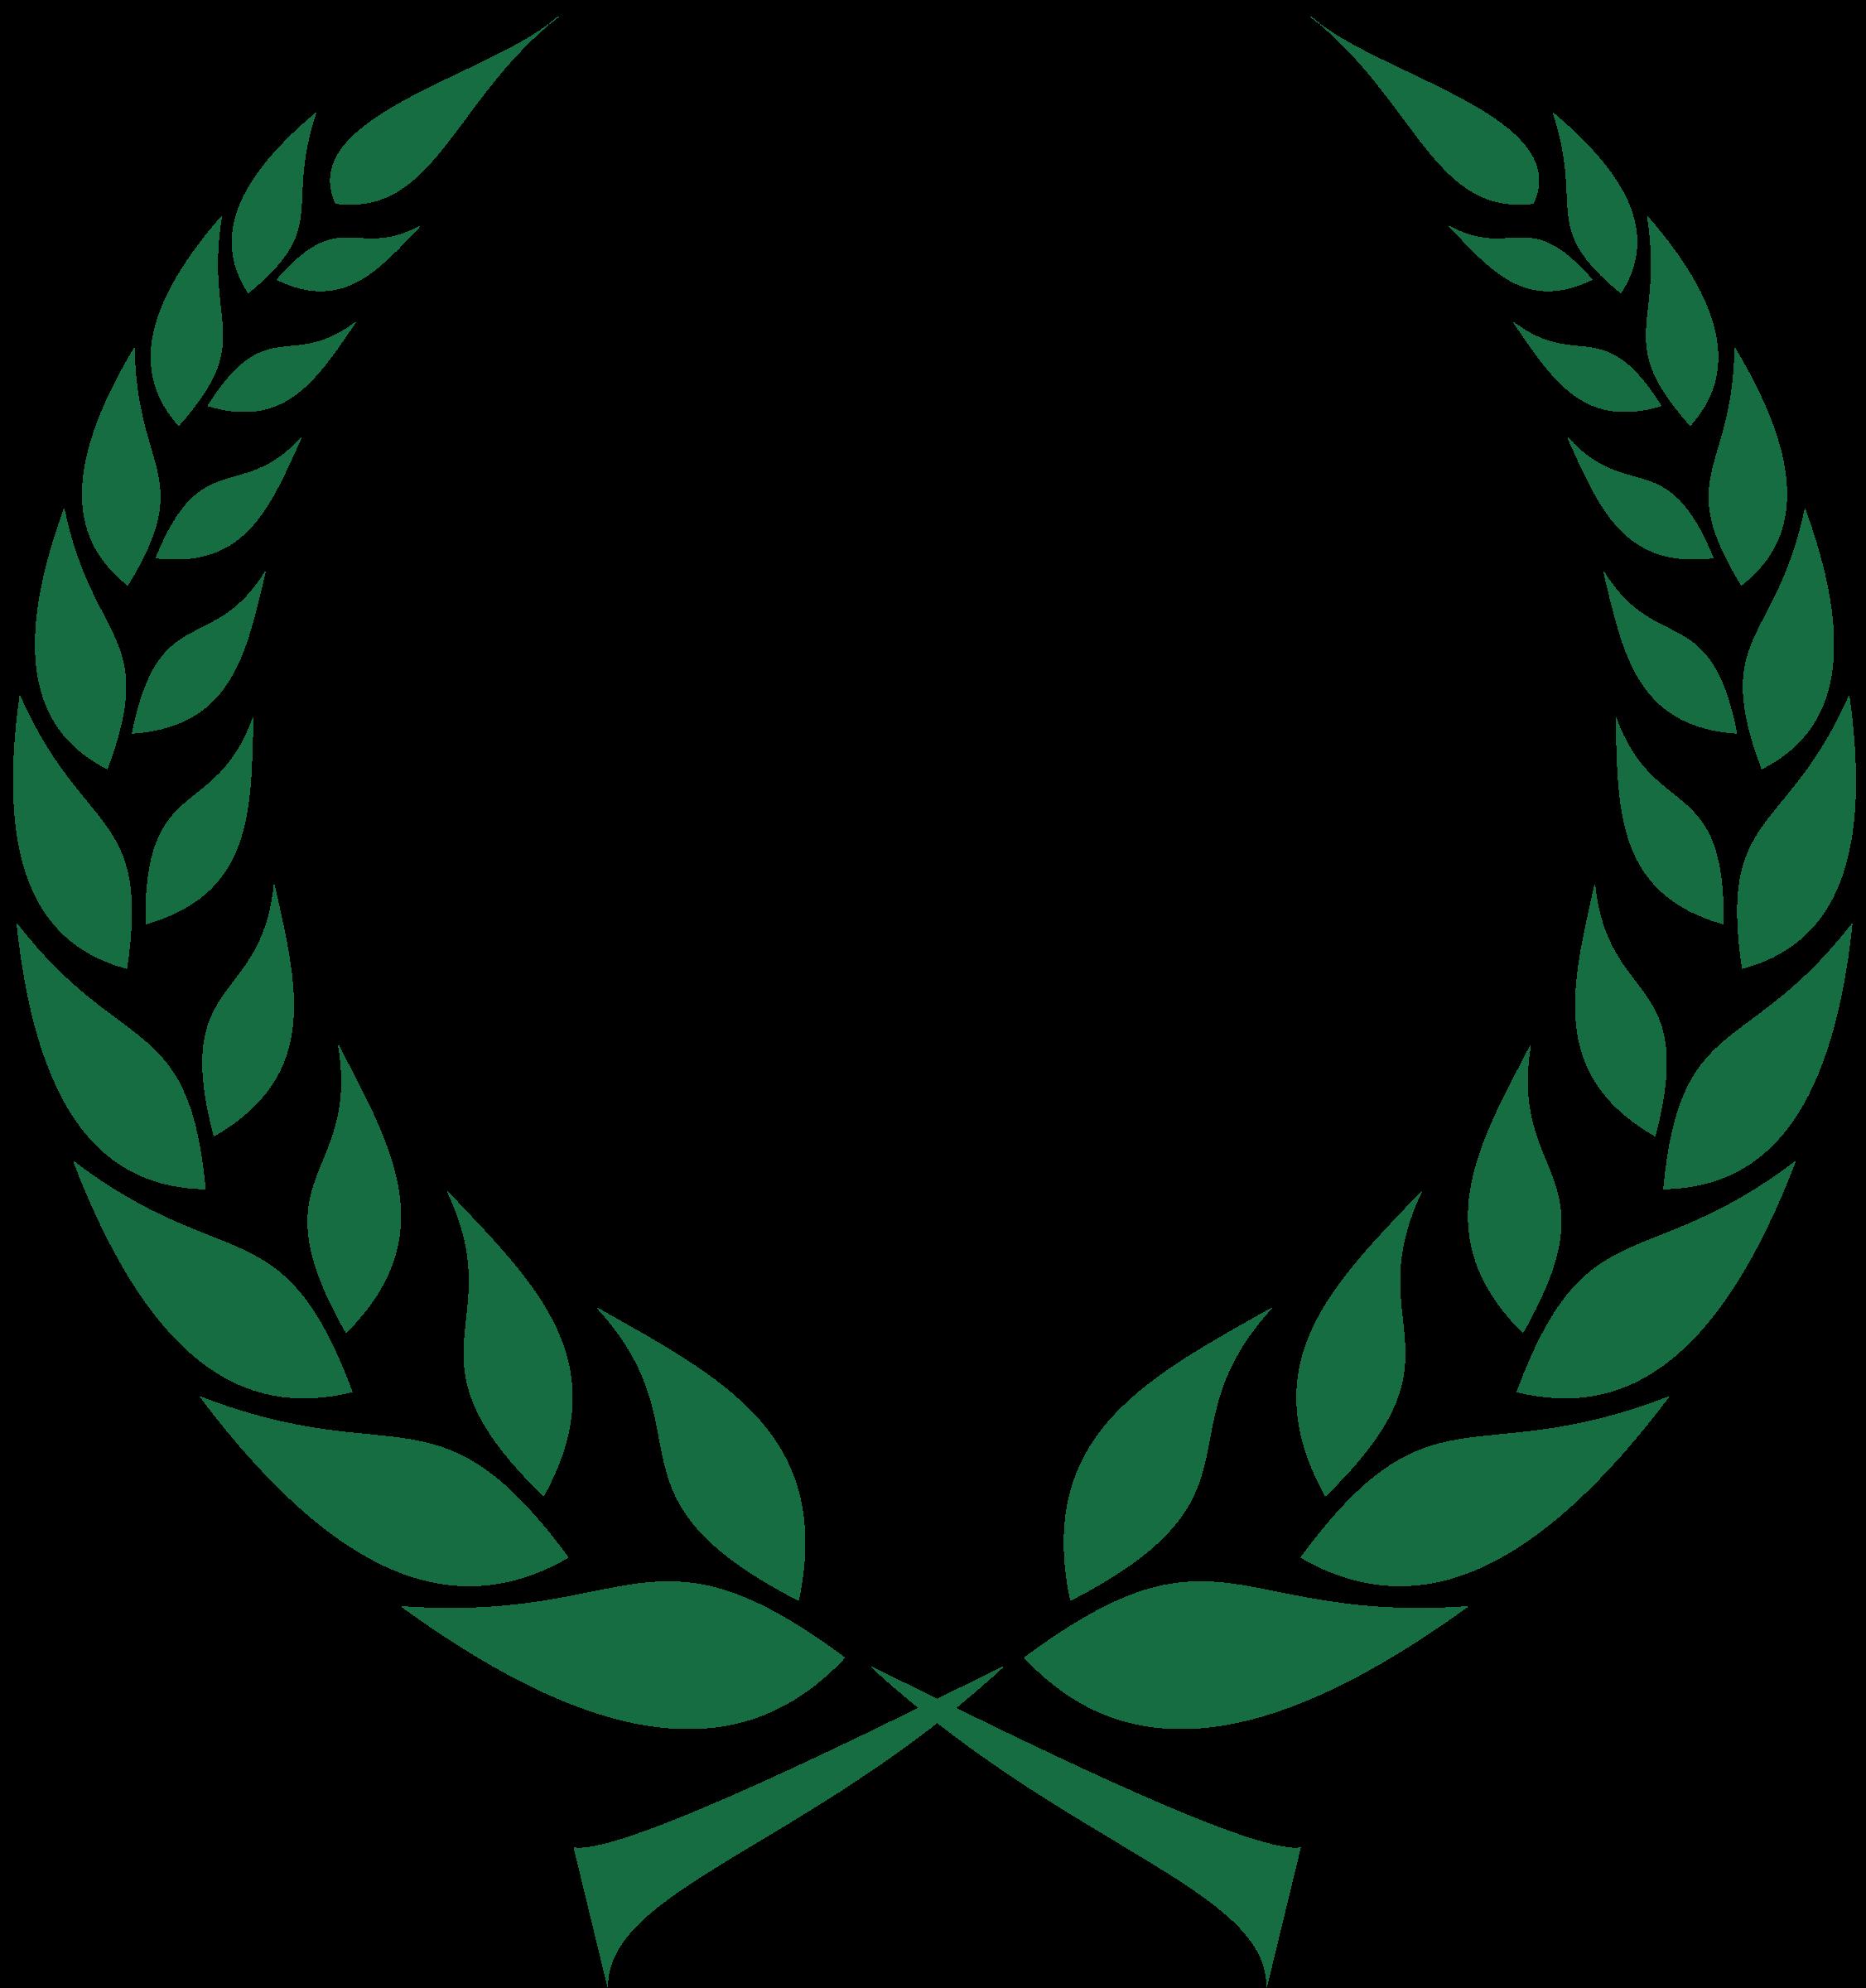 2253x2400 Free Clipart Olympic Laurel Wreath